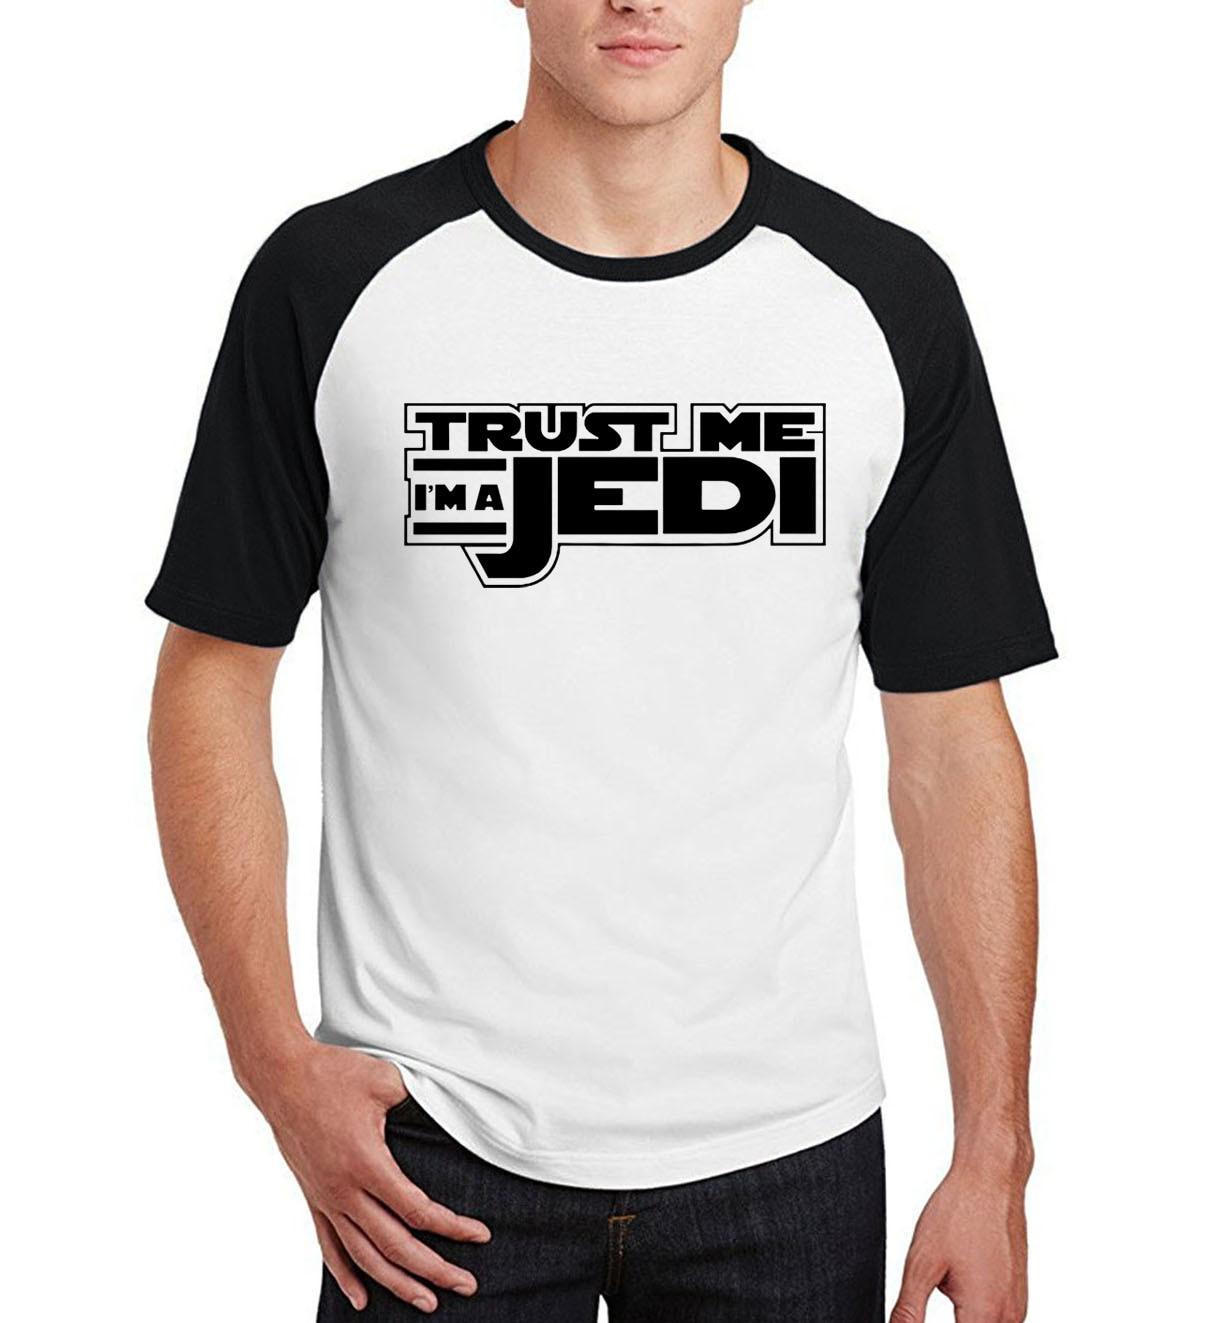 b7163b534 المتناثرة أنا camisetas الرجال الأزياء حرب النجوم تي شيرت 2019 الصيف القطن  راجلان قصيرة الأكمام قمم اللياقة البدنية الملابس